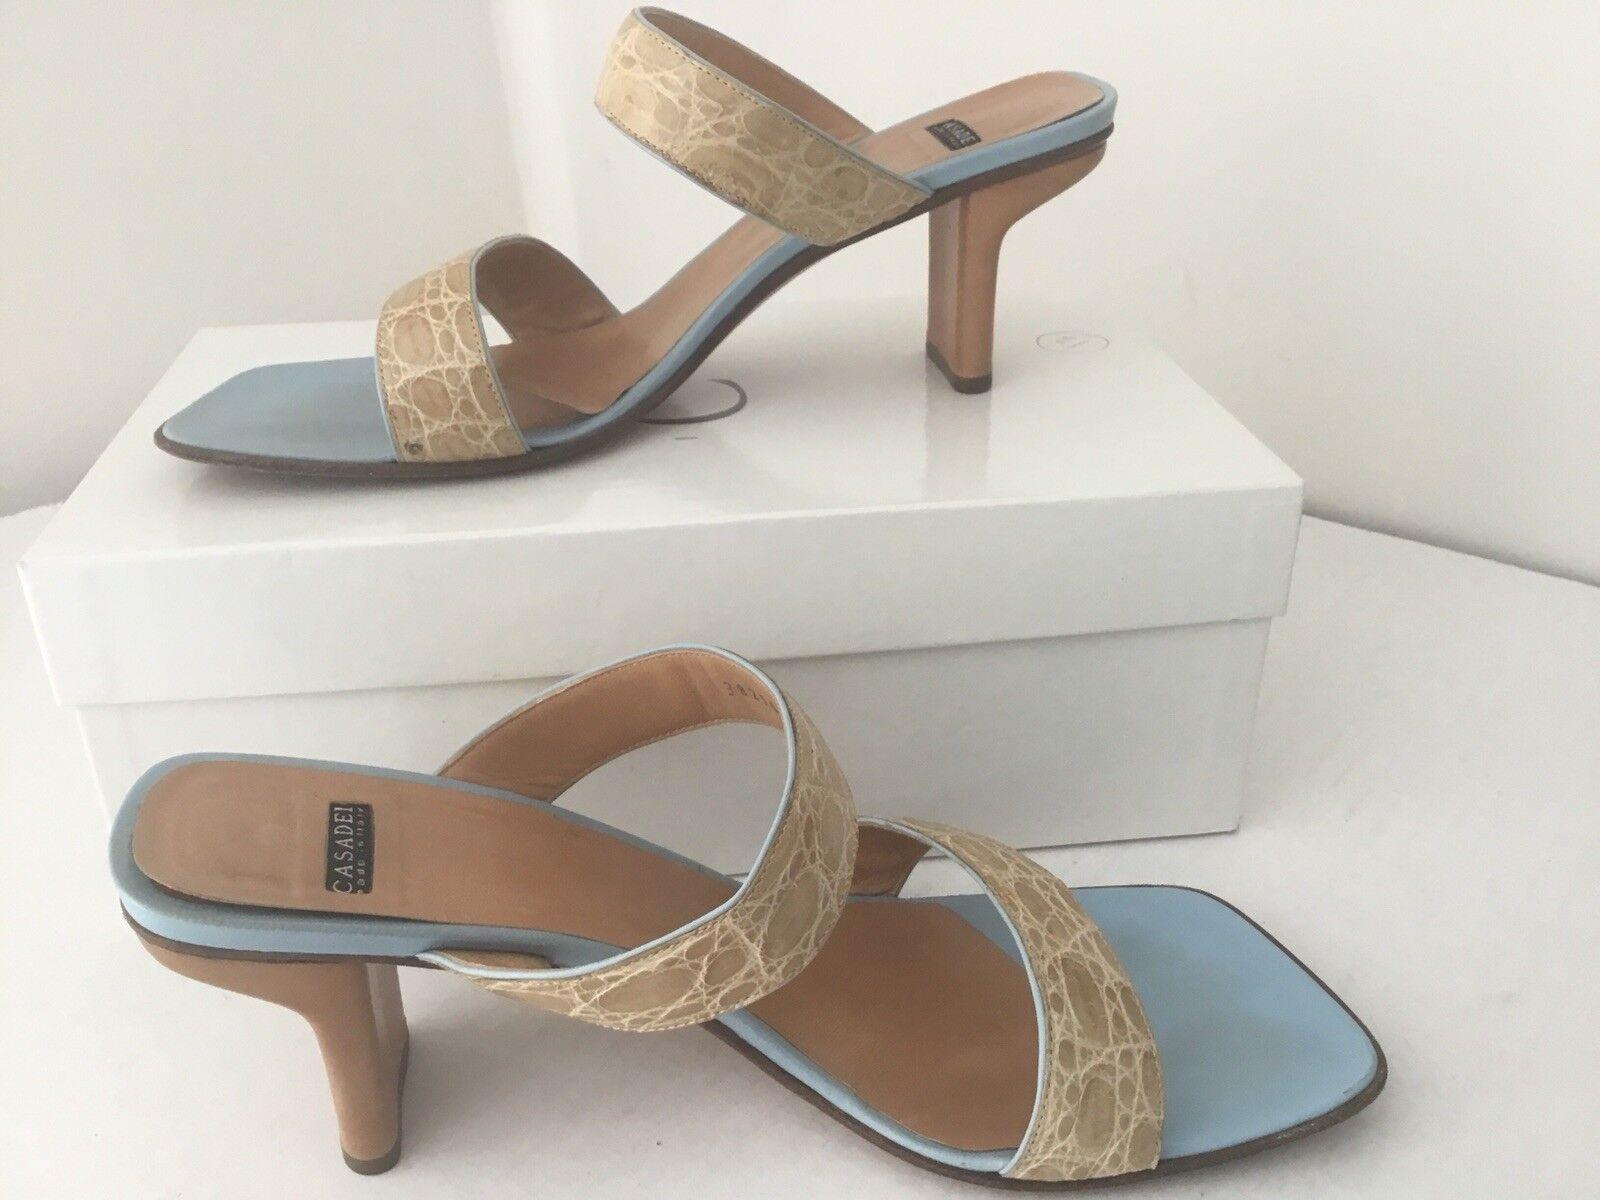 Casadei Beige / blau Heels 9.5 schuhes  Size 9.5 Heels Italy 35ad8a